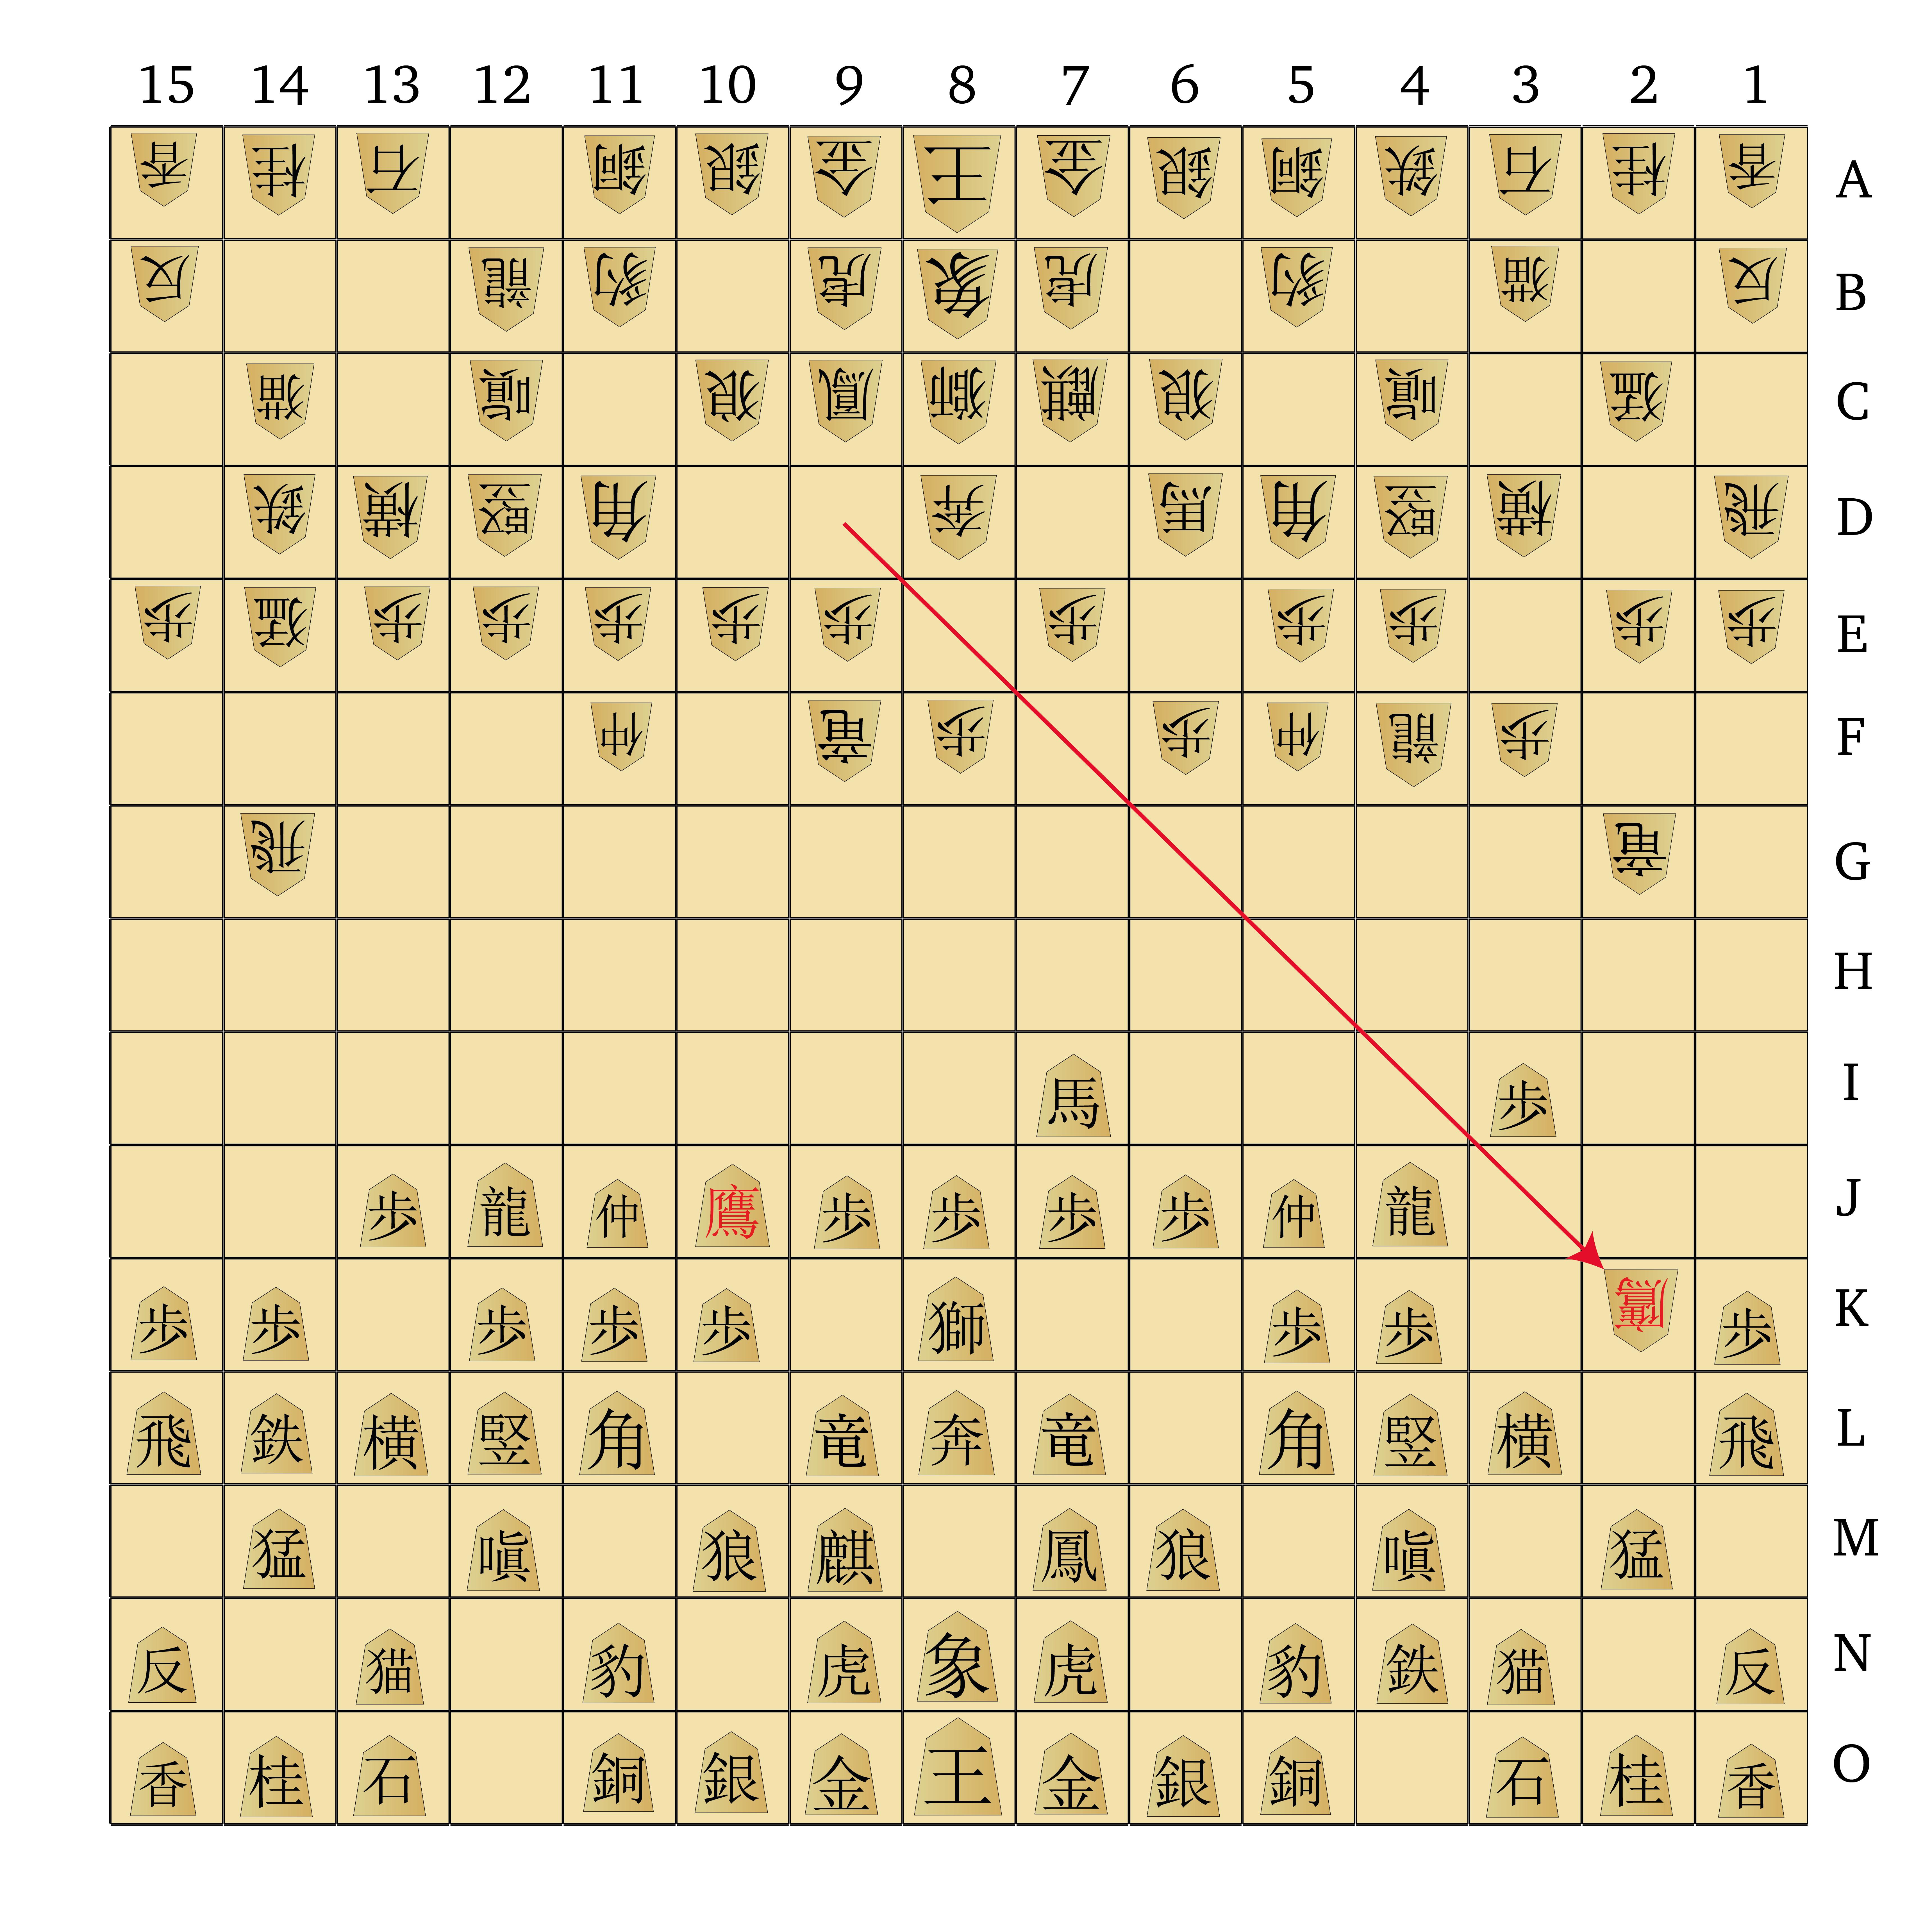 Dai Shogi 420 -- Move 40-01